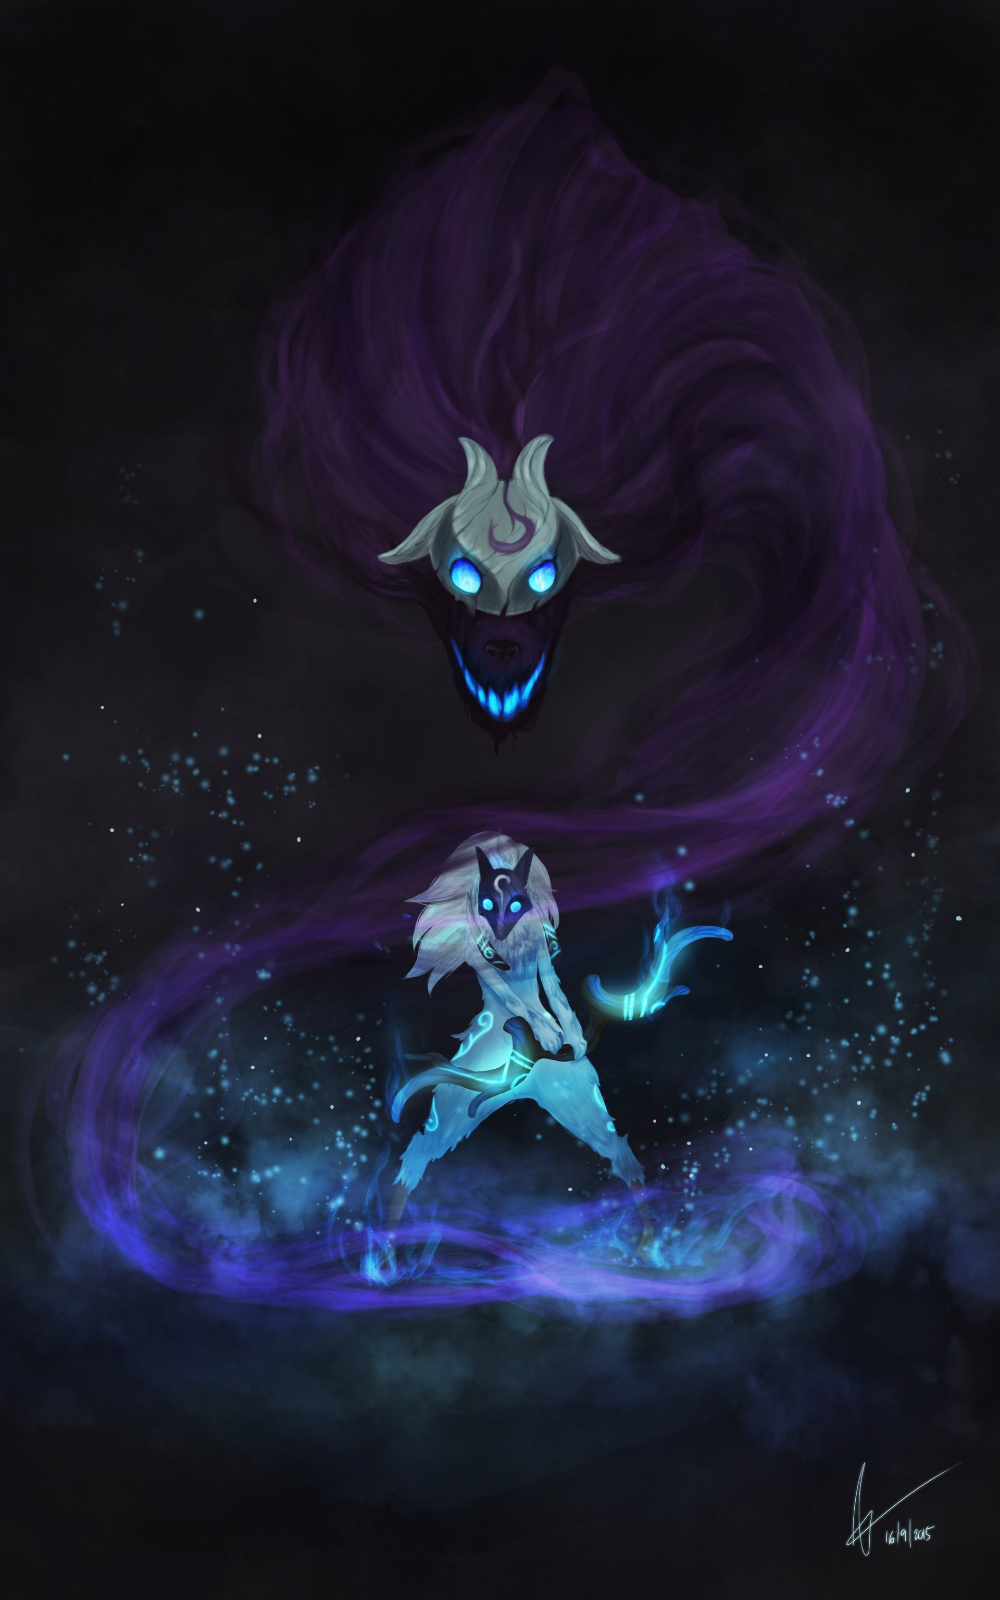 ArtStation Kindred League of Legends, Mireia Garcia